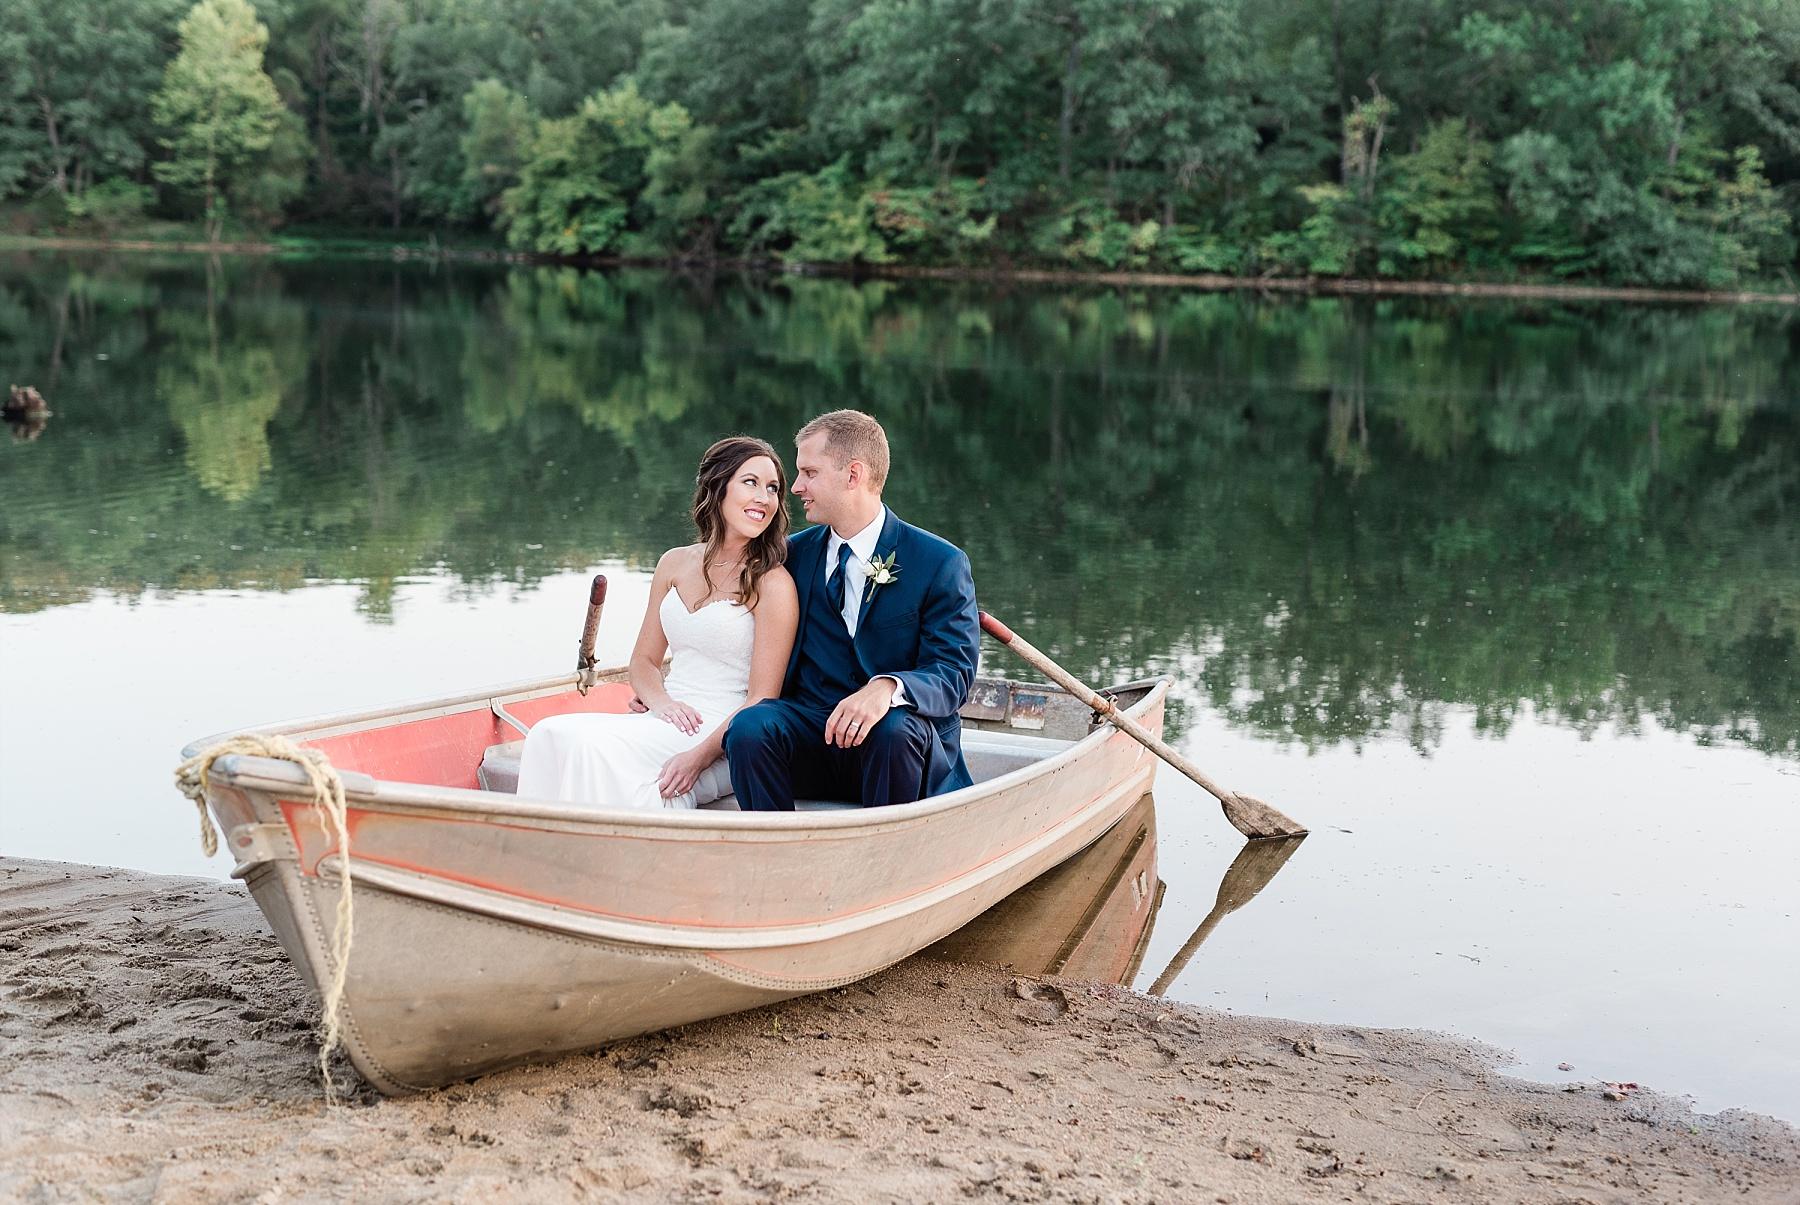 Romantic Summer Sunset Wedding Ceremony at Little Piney Lodge St. Louis Missouri by Kelsi Kliethermes Photography Fine Art Photographer_0018.jpg